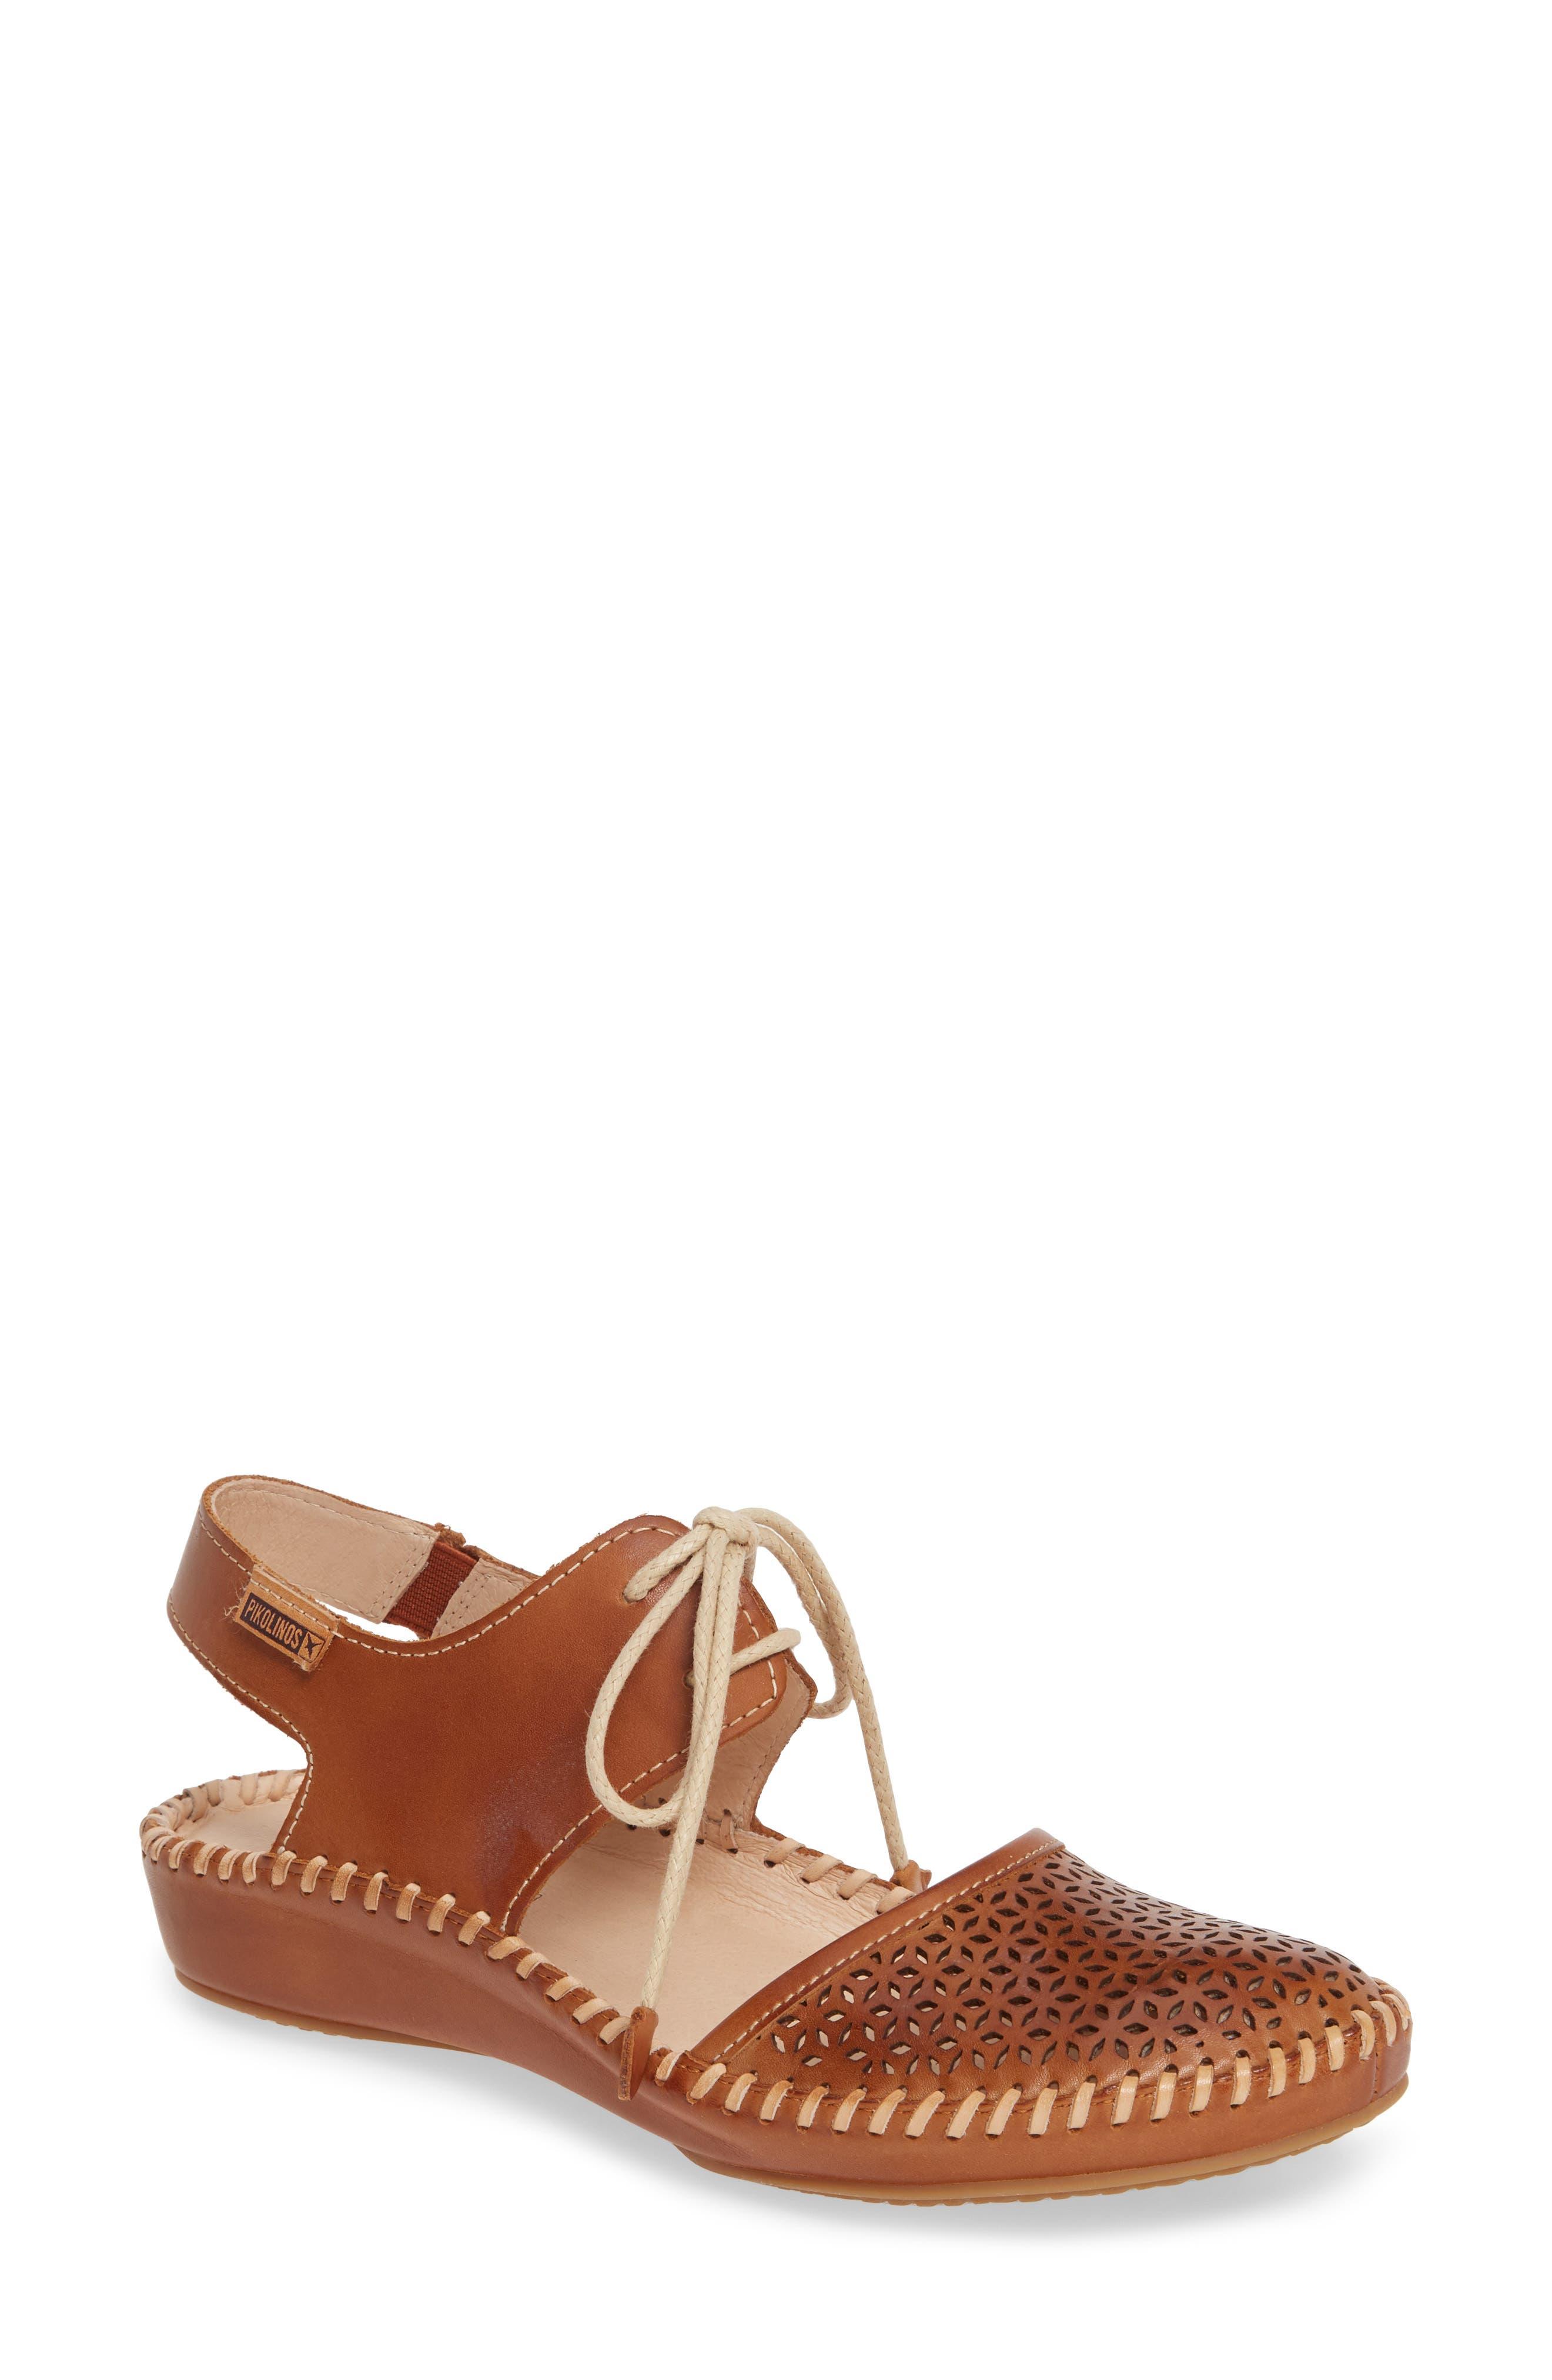 Pikolinos Puerto Vallarta Lace-Up Sandal, Brown